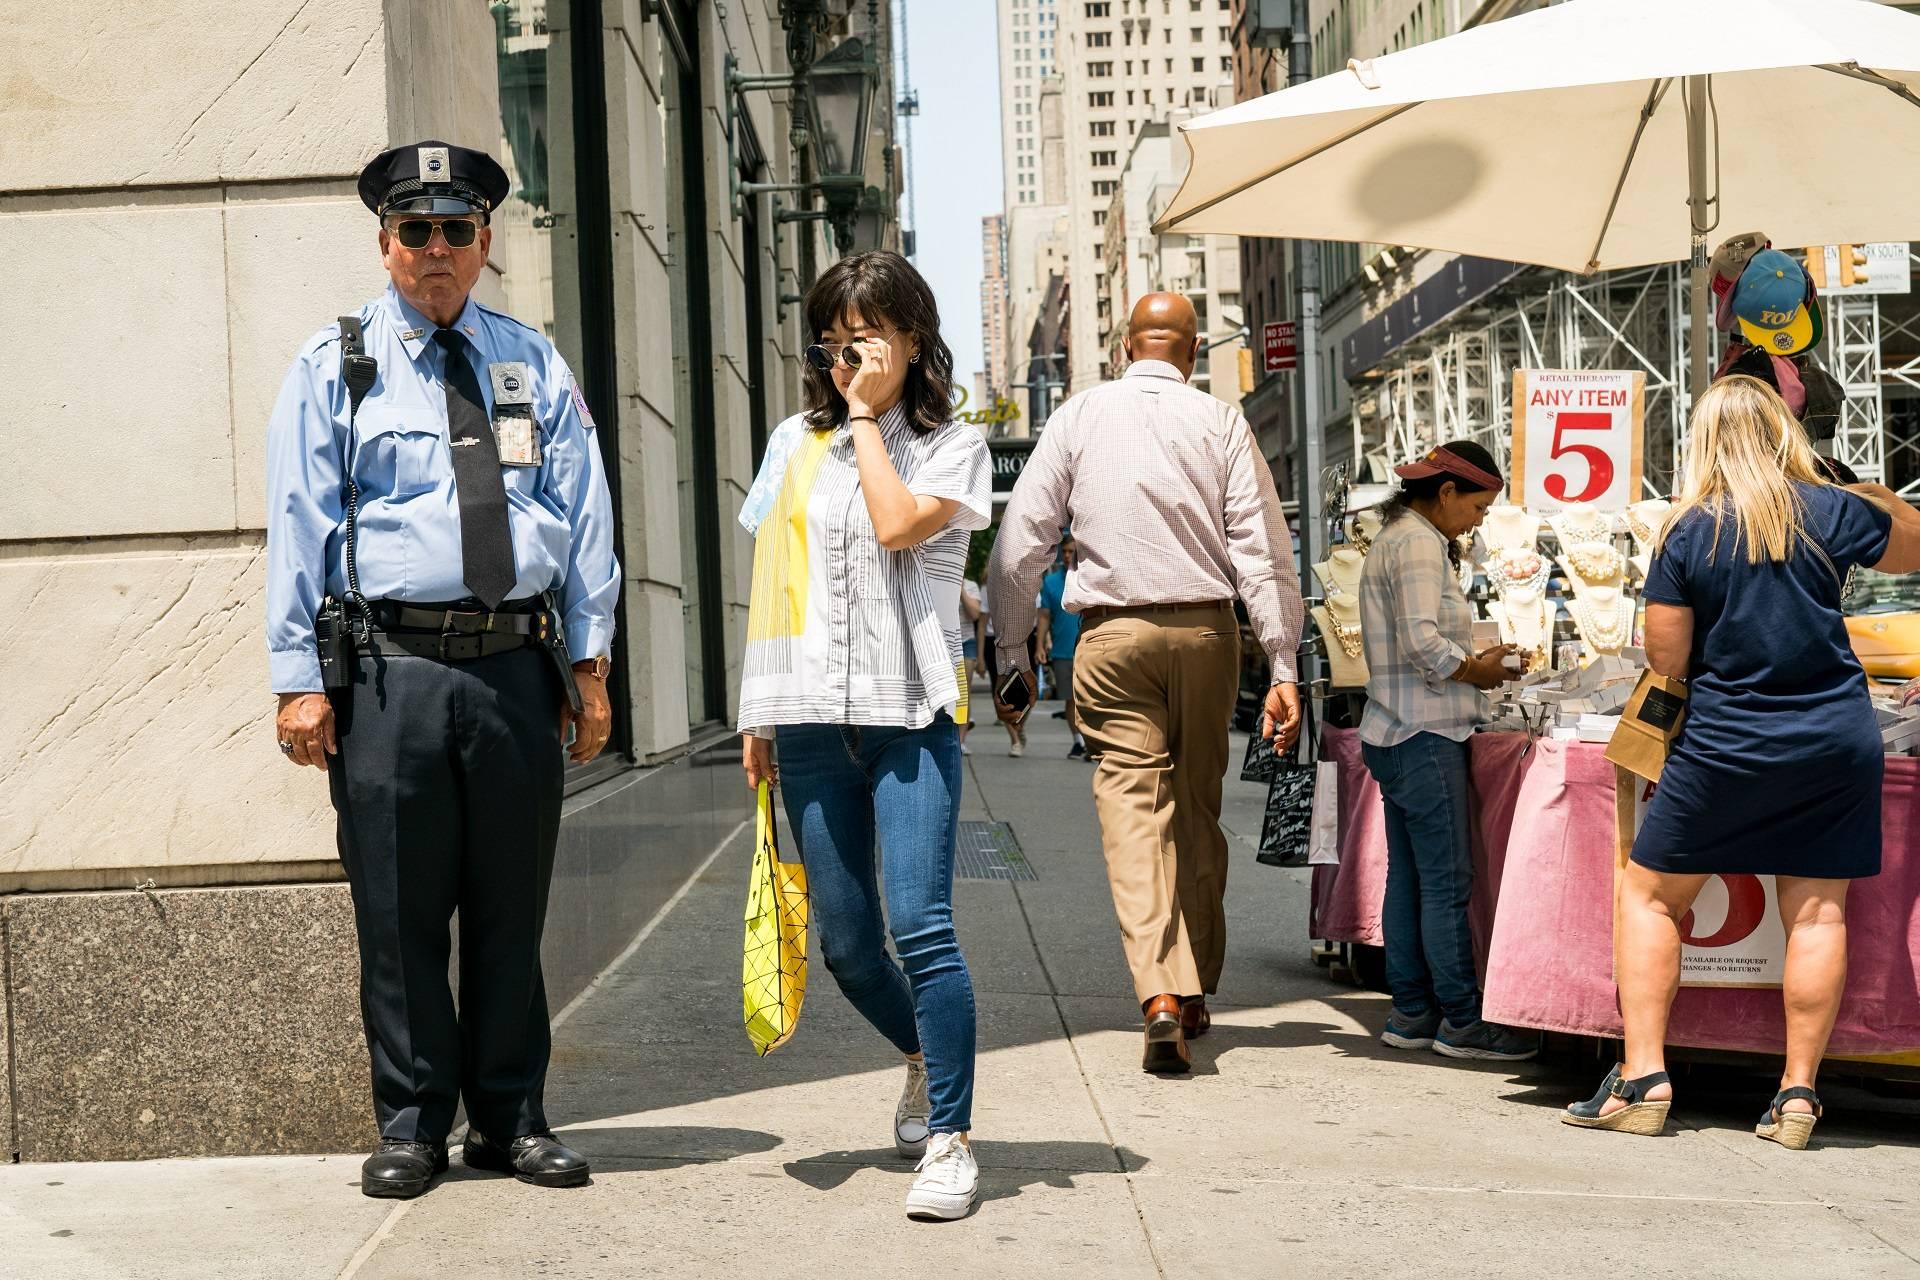 New York Streets by Alex Kaplan